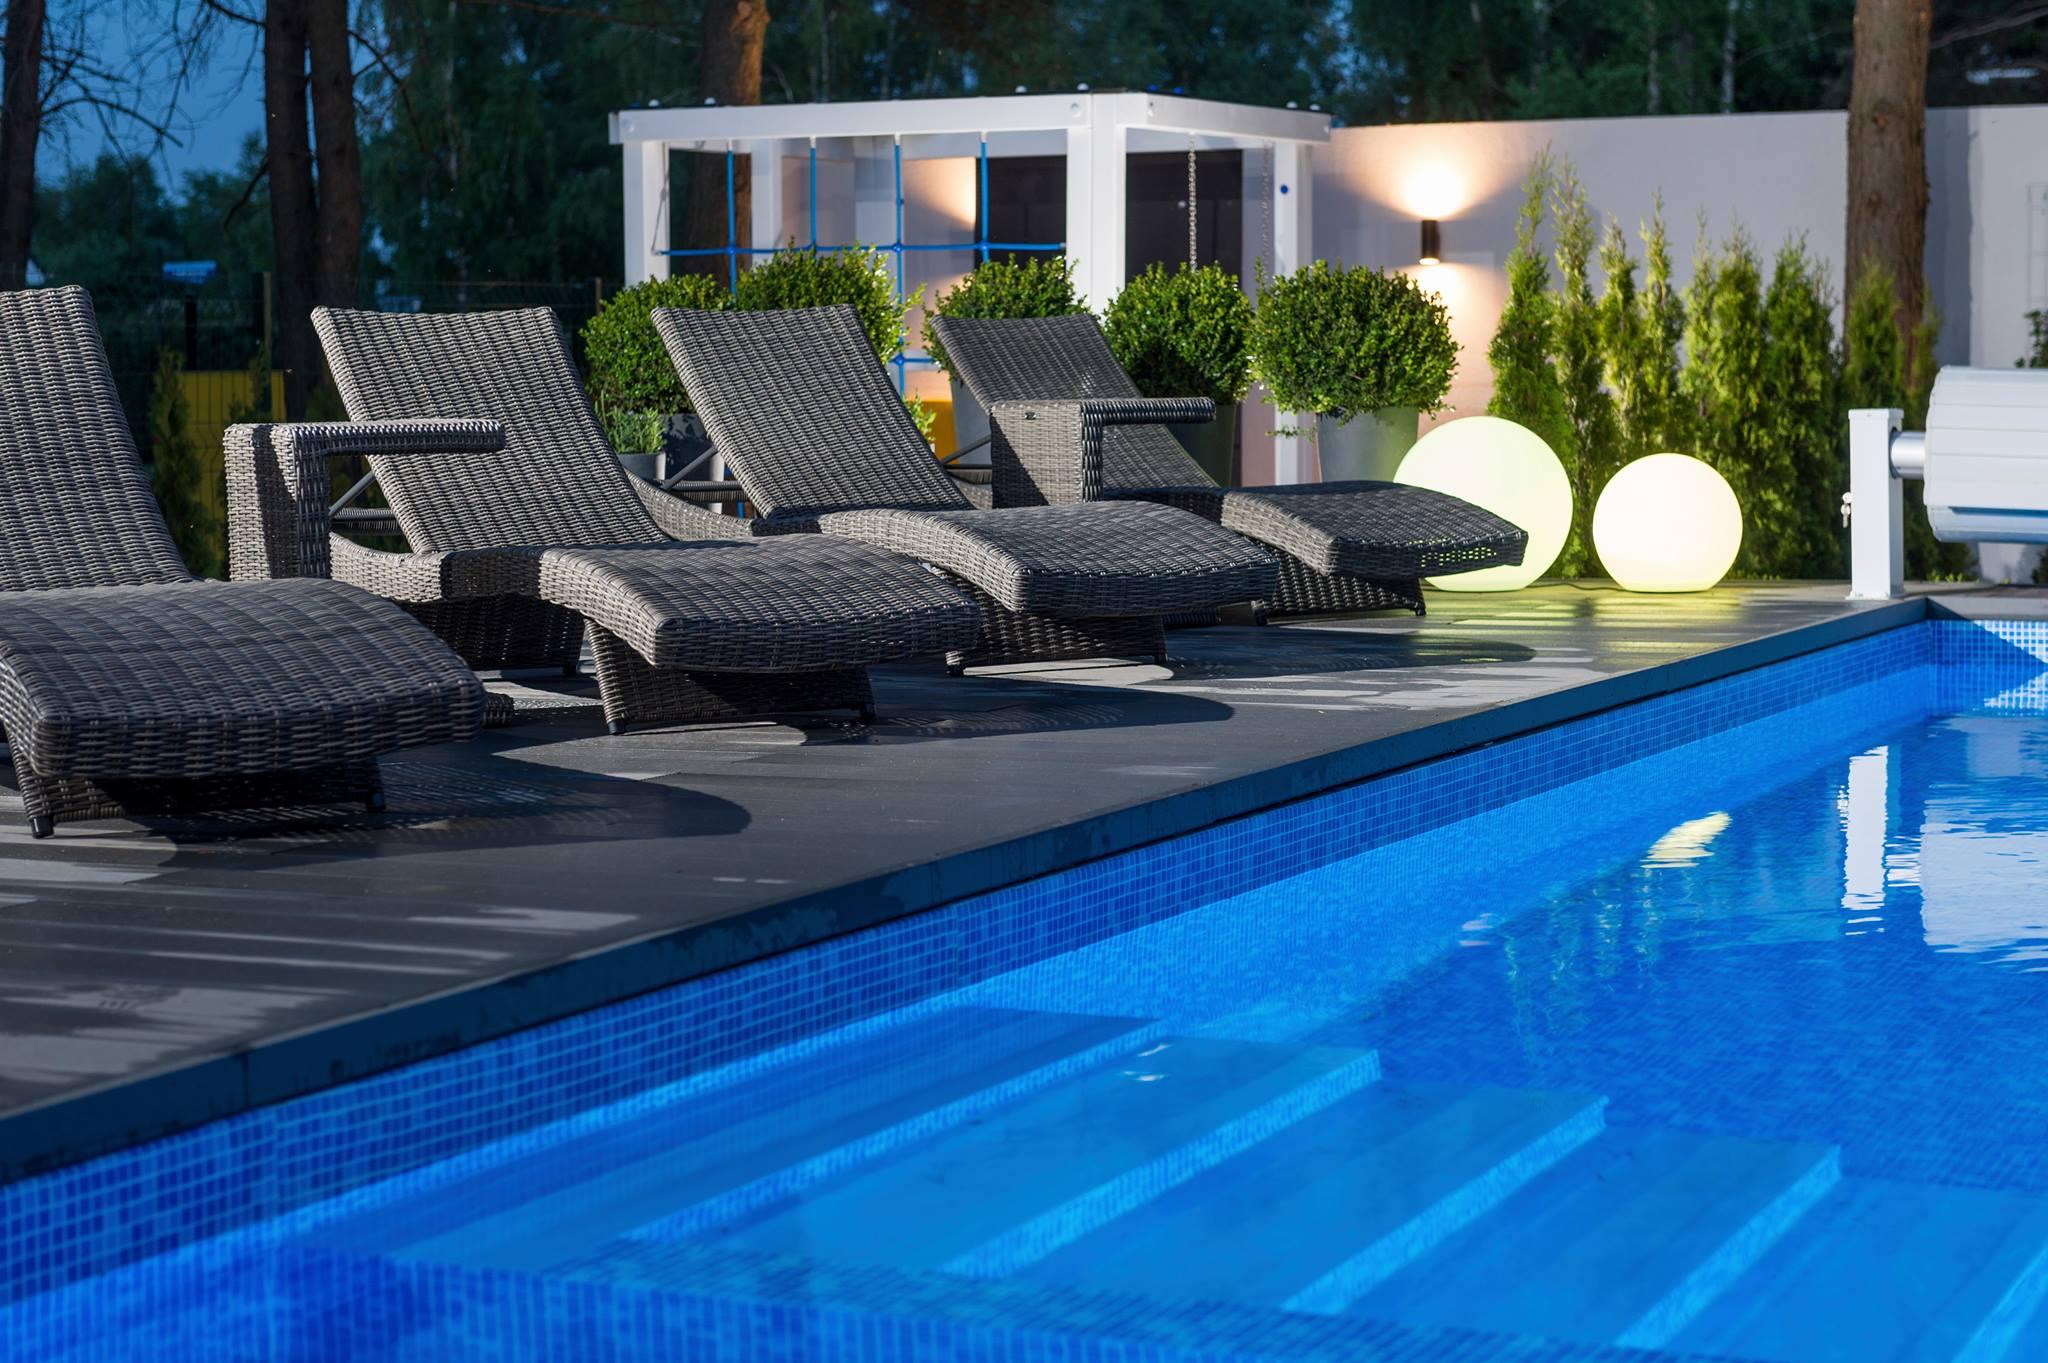 Apartamenty VillaSanibel - Garden Space - Oltre Outdoor Indoor Design - meble do ogrodu, meble ogrodowe, meble hotelowe